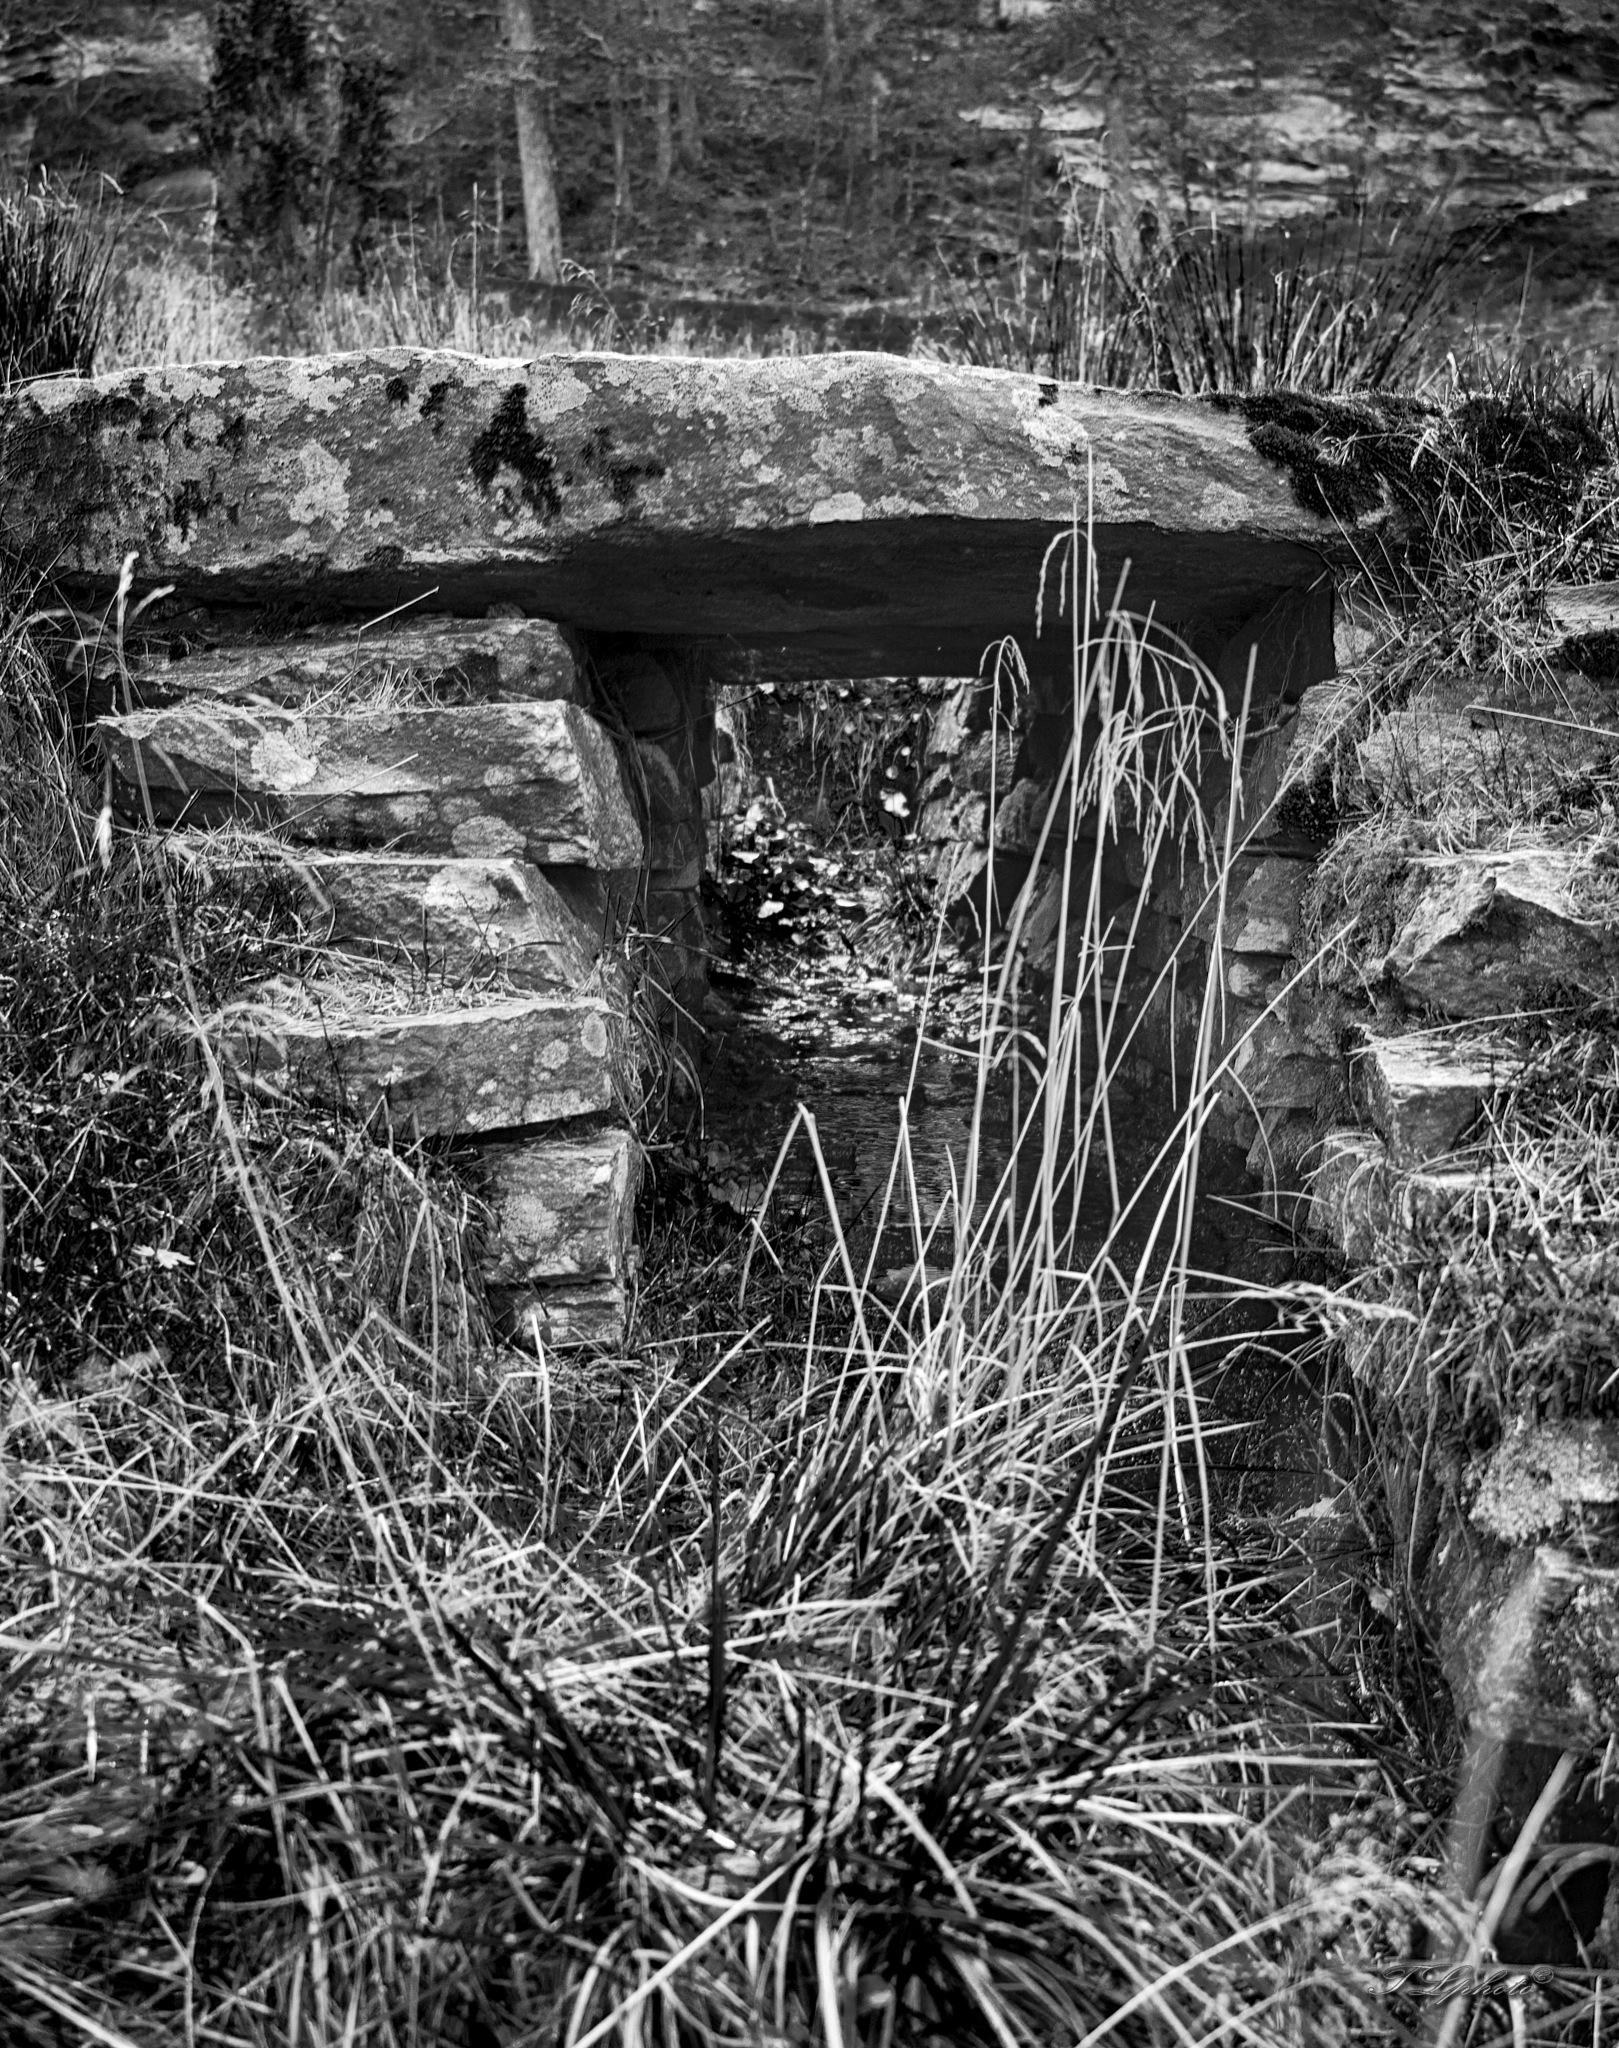 the stonebridge in bw by Thore's photo